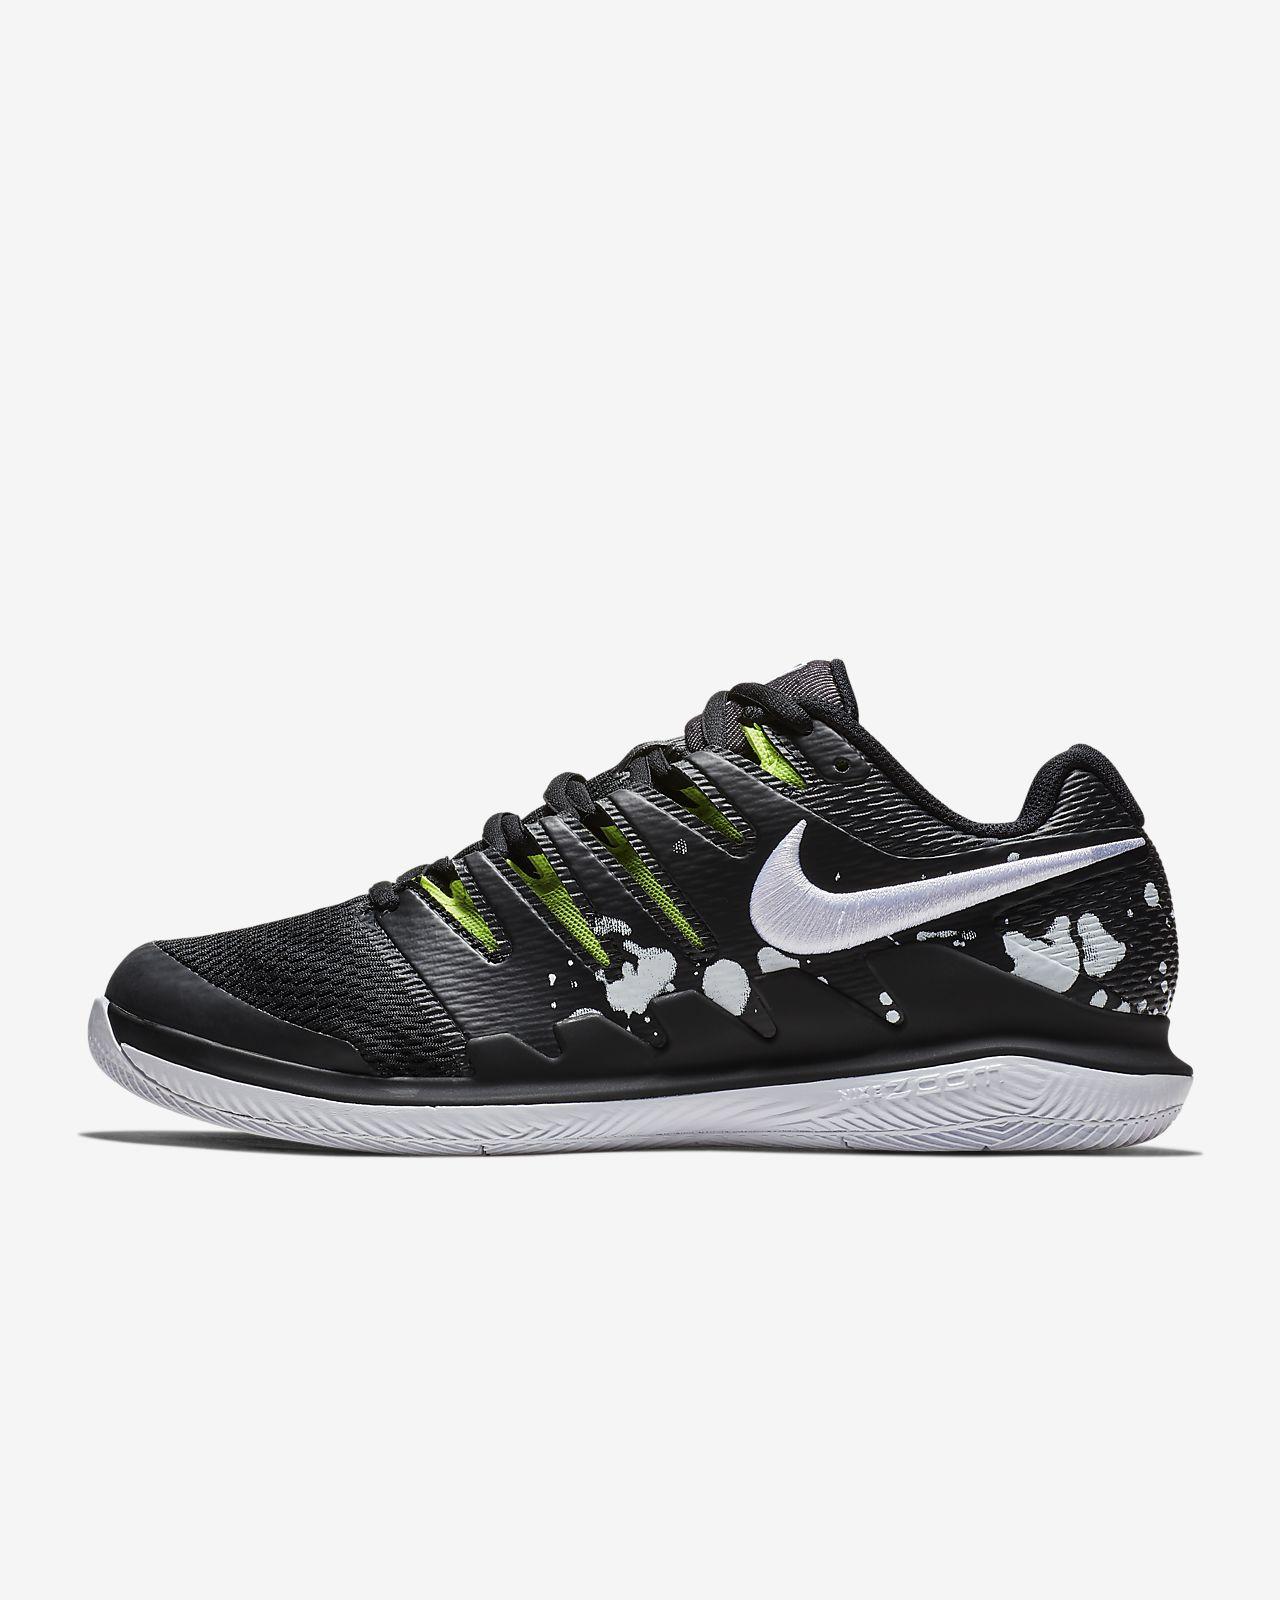 c038a050dee43 ... Scarpa da tennis NikeCourt Air Zoom Vapor X Premium Hard Court - Uomo